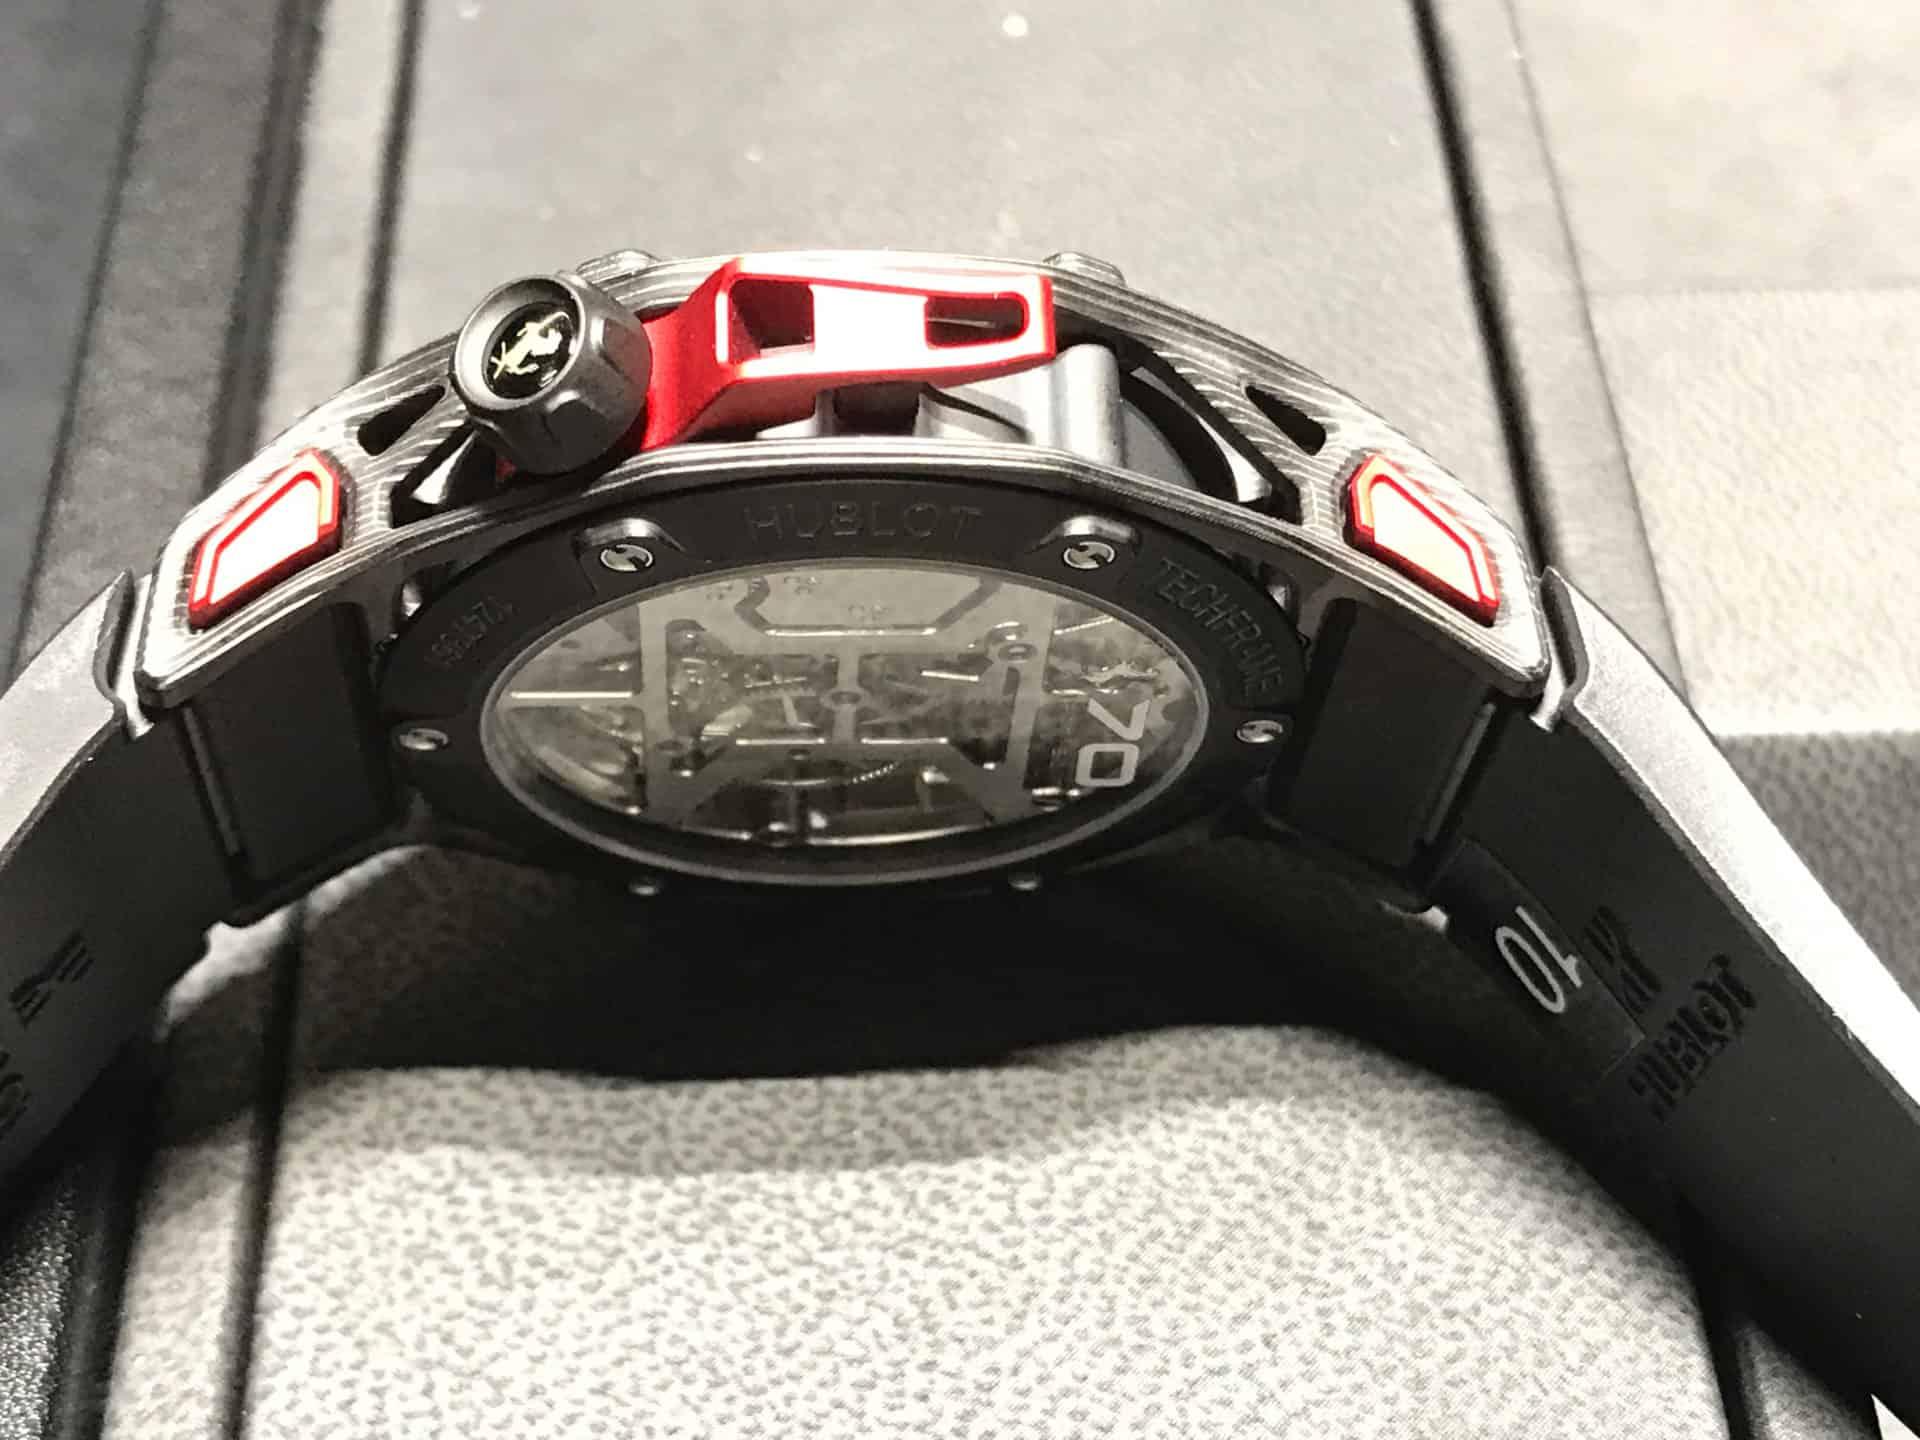 Hublot . Techframe Ferrari 70 years Tourbillon Chronograph - 2017_2